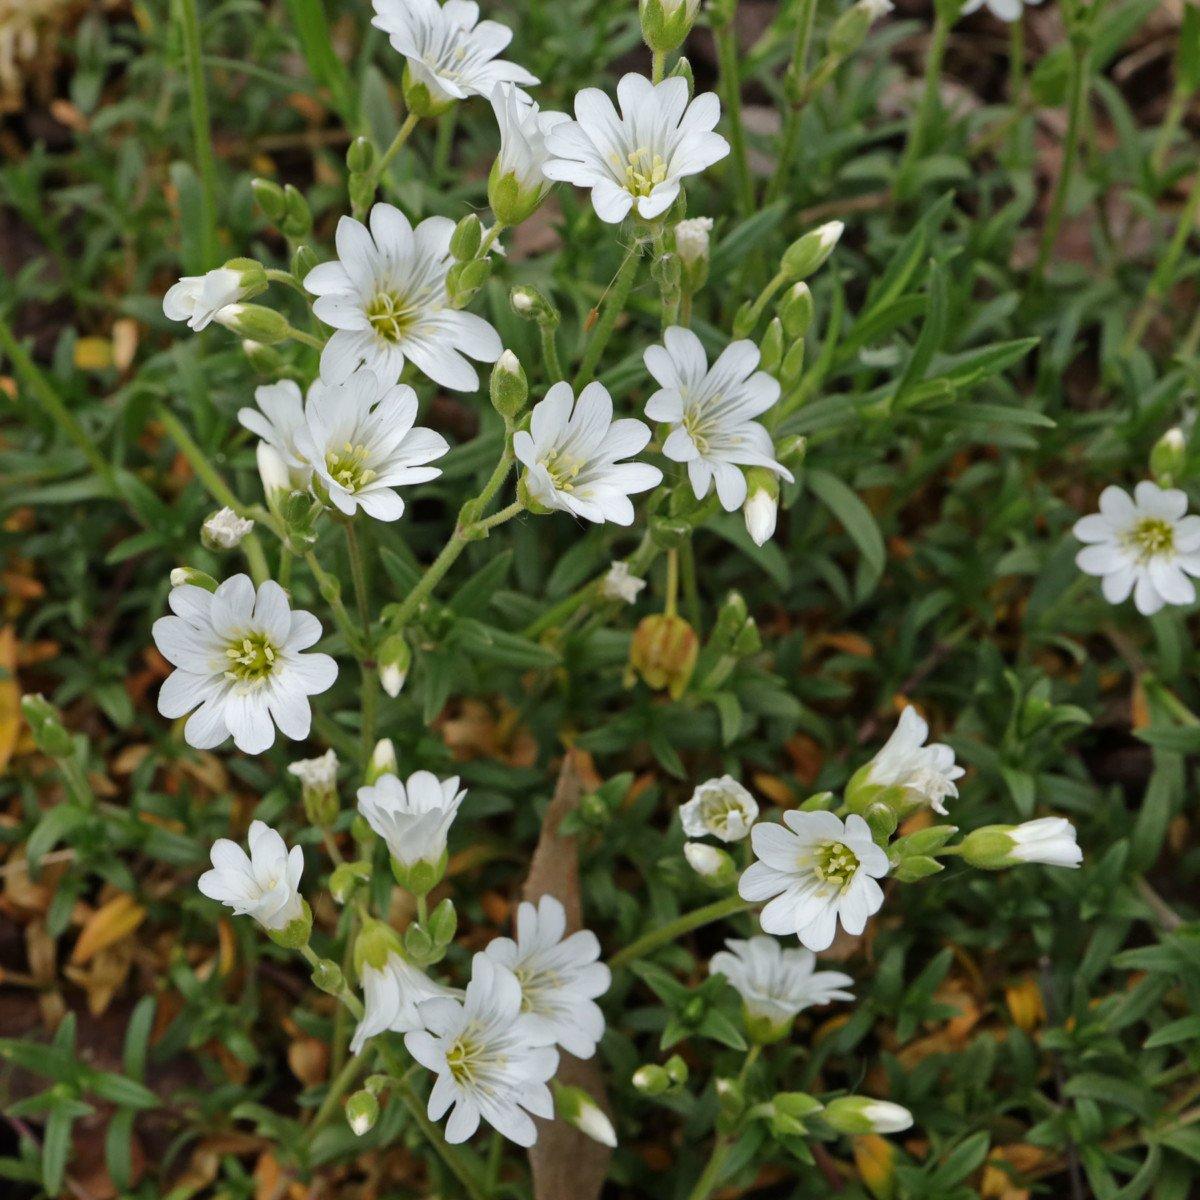 Cerastium arvense ssp. arvense